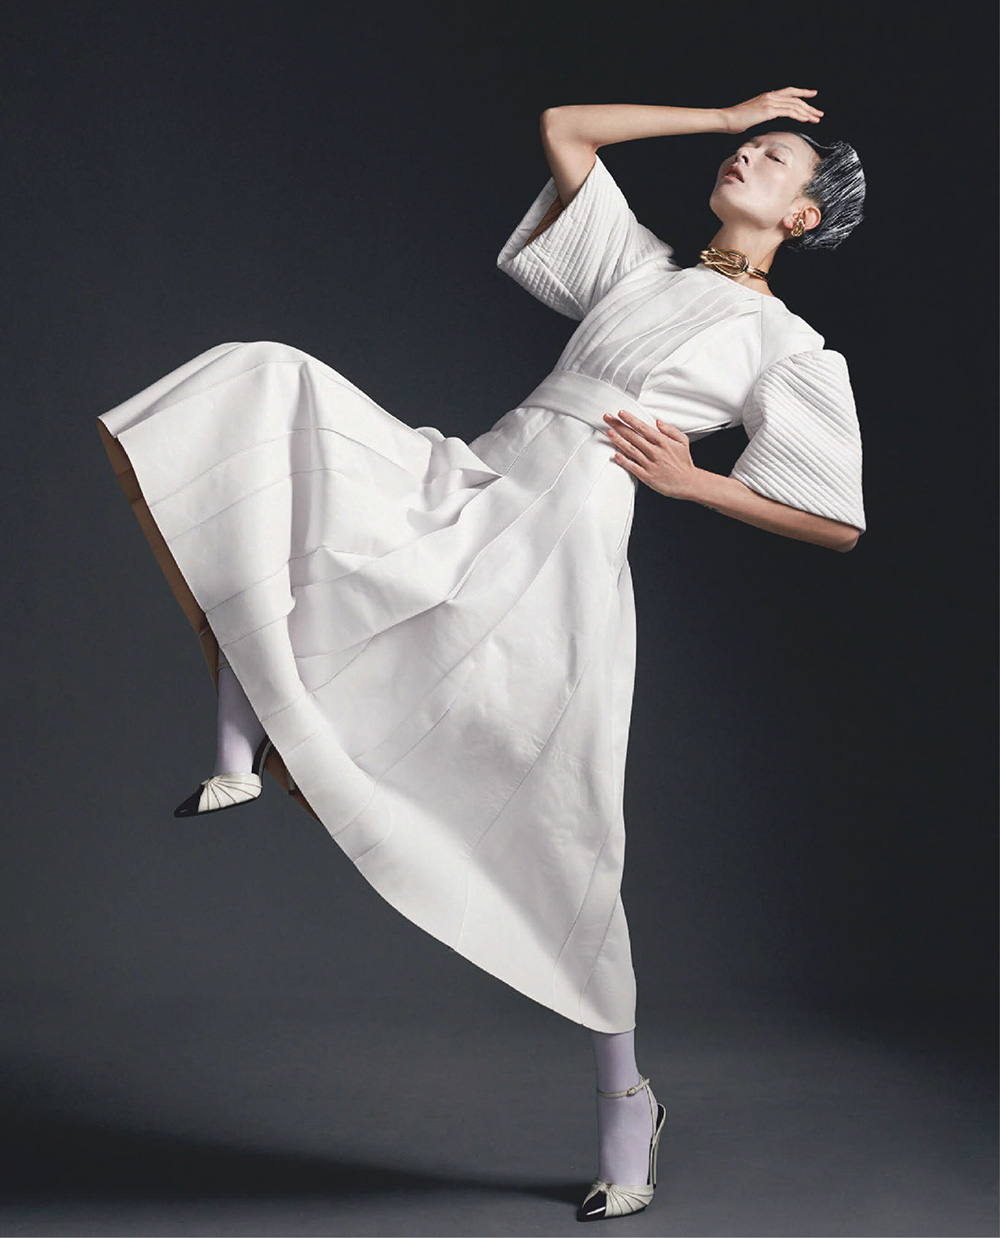 Frances Liu and Vanessa Pan by Cheng Po Ou Yang for Vogue Taiwan December 2020